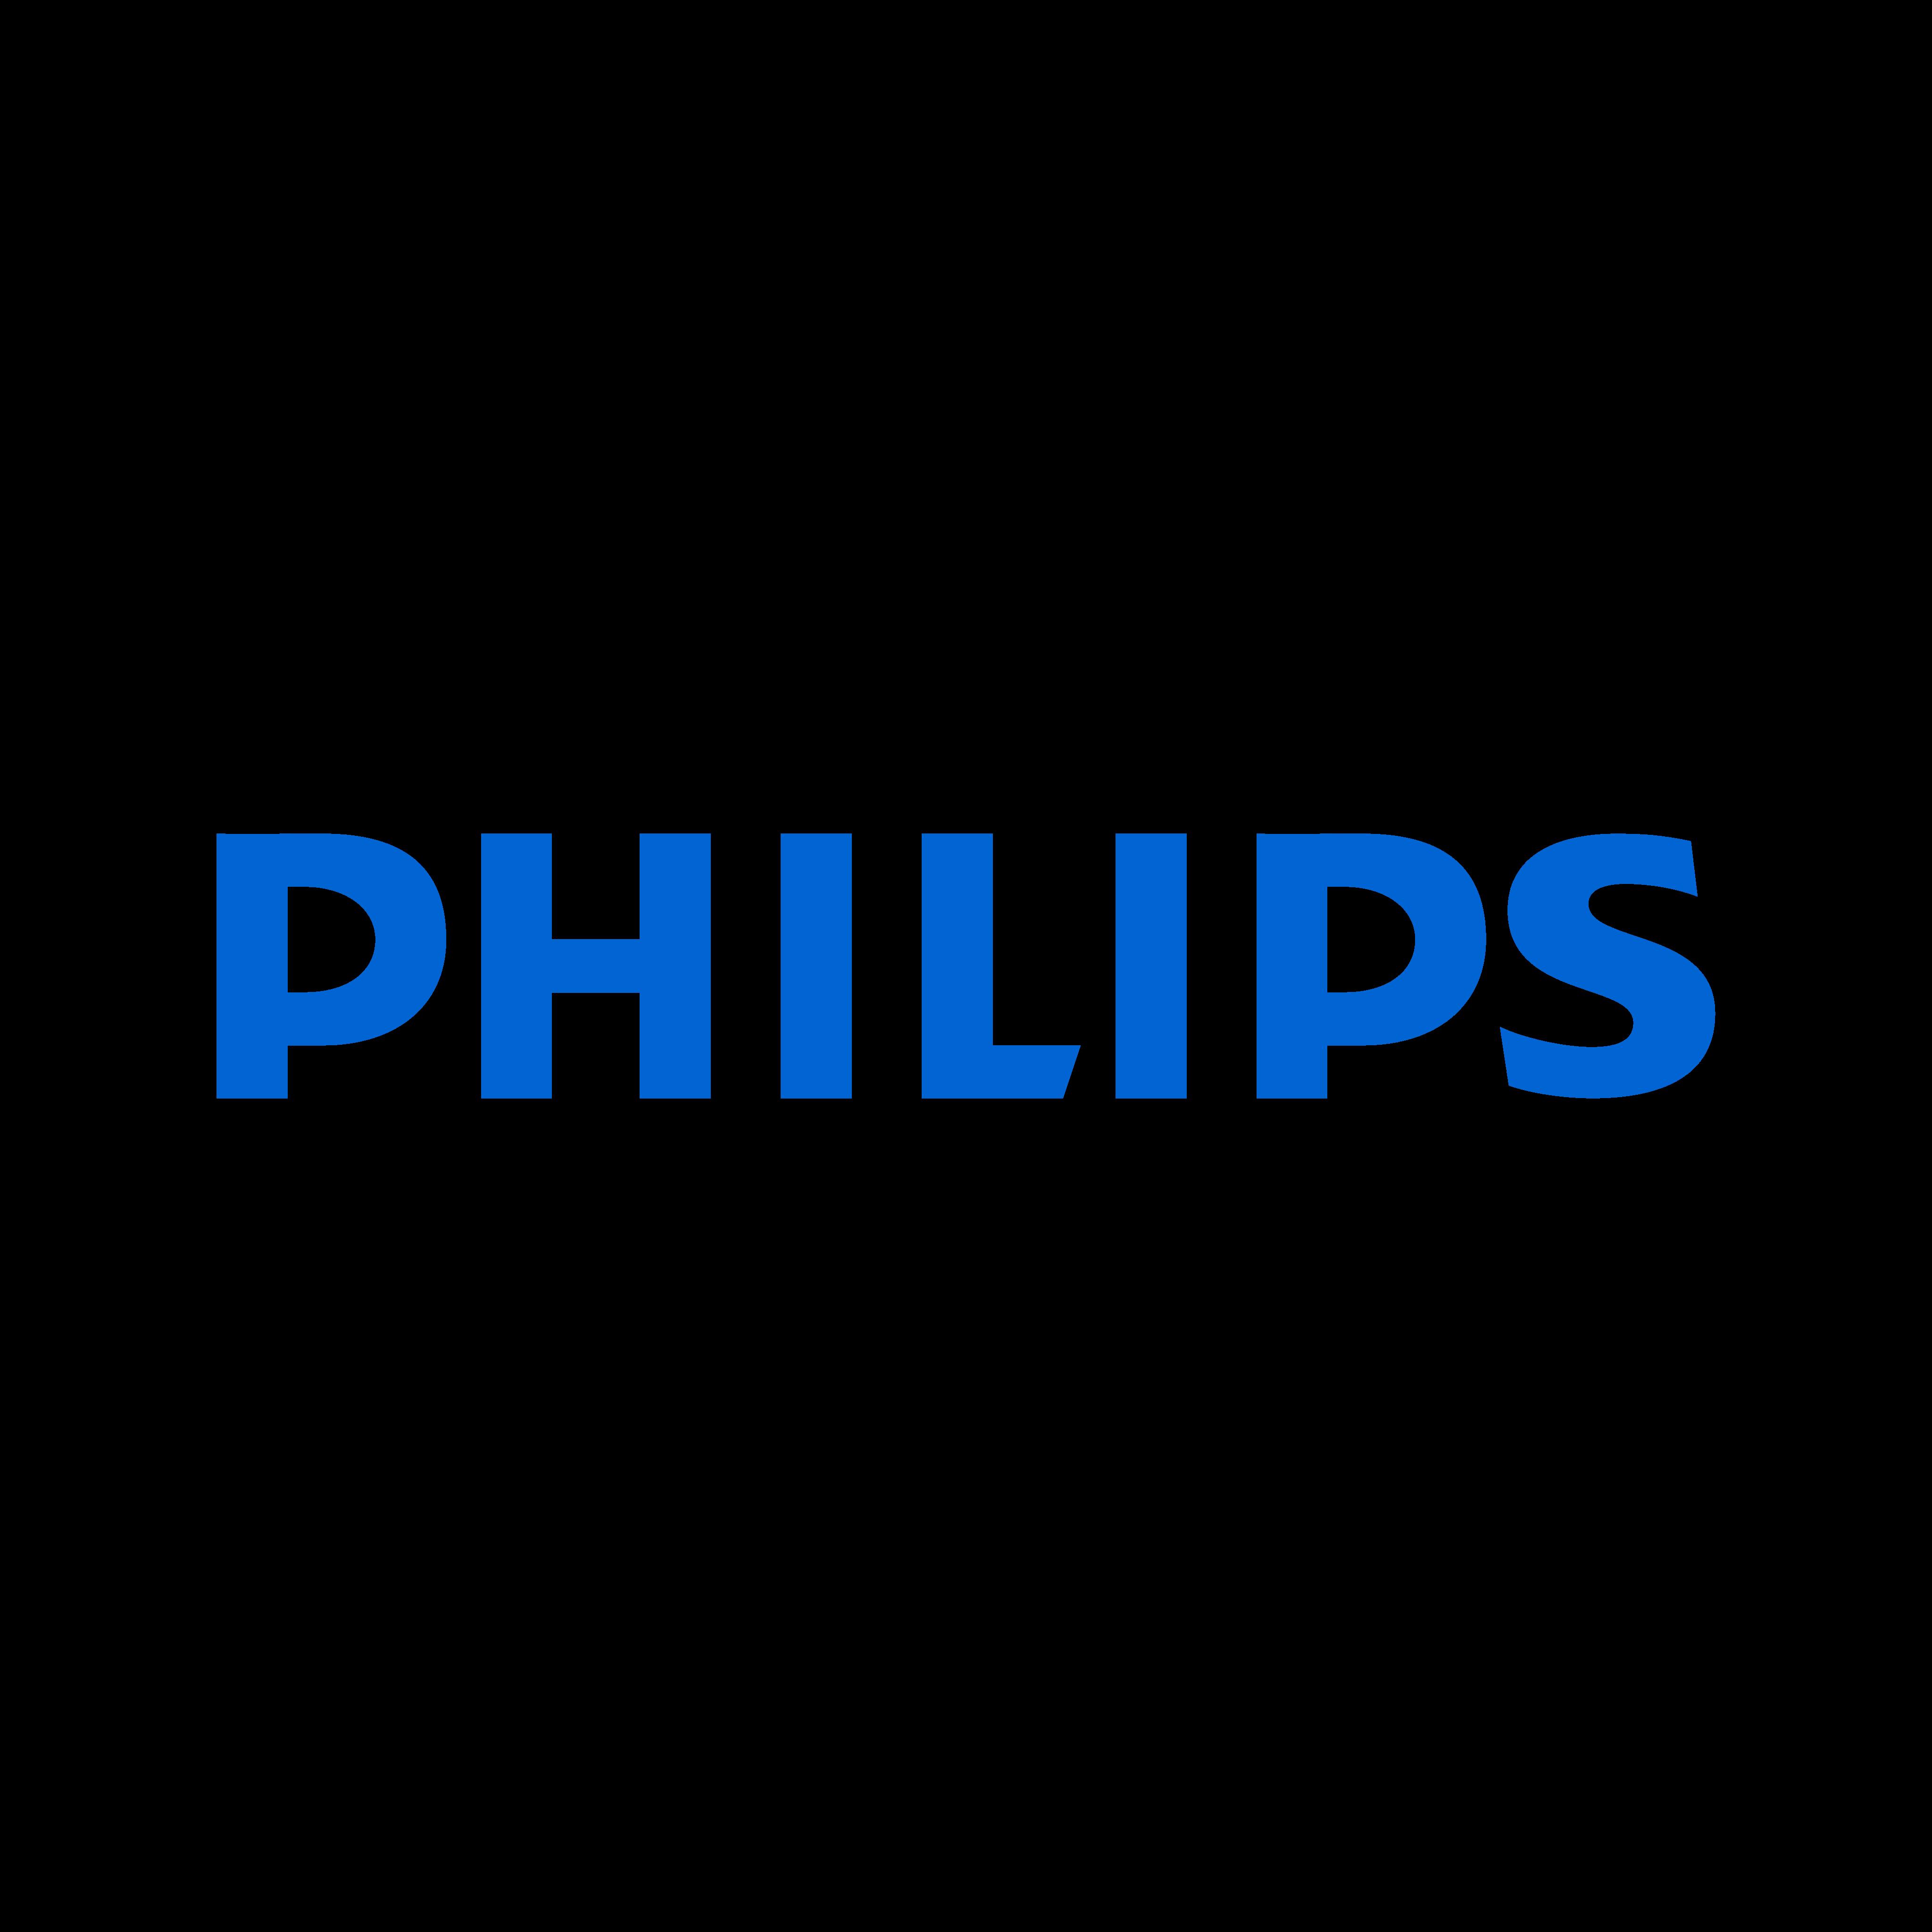 philips logo 0 - Philips Logo